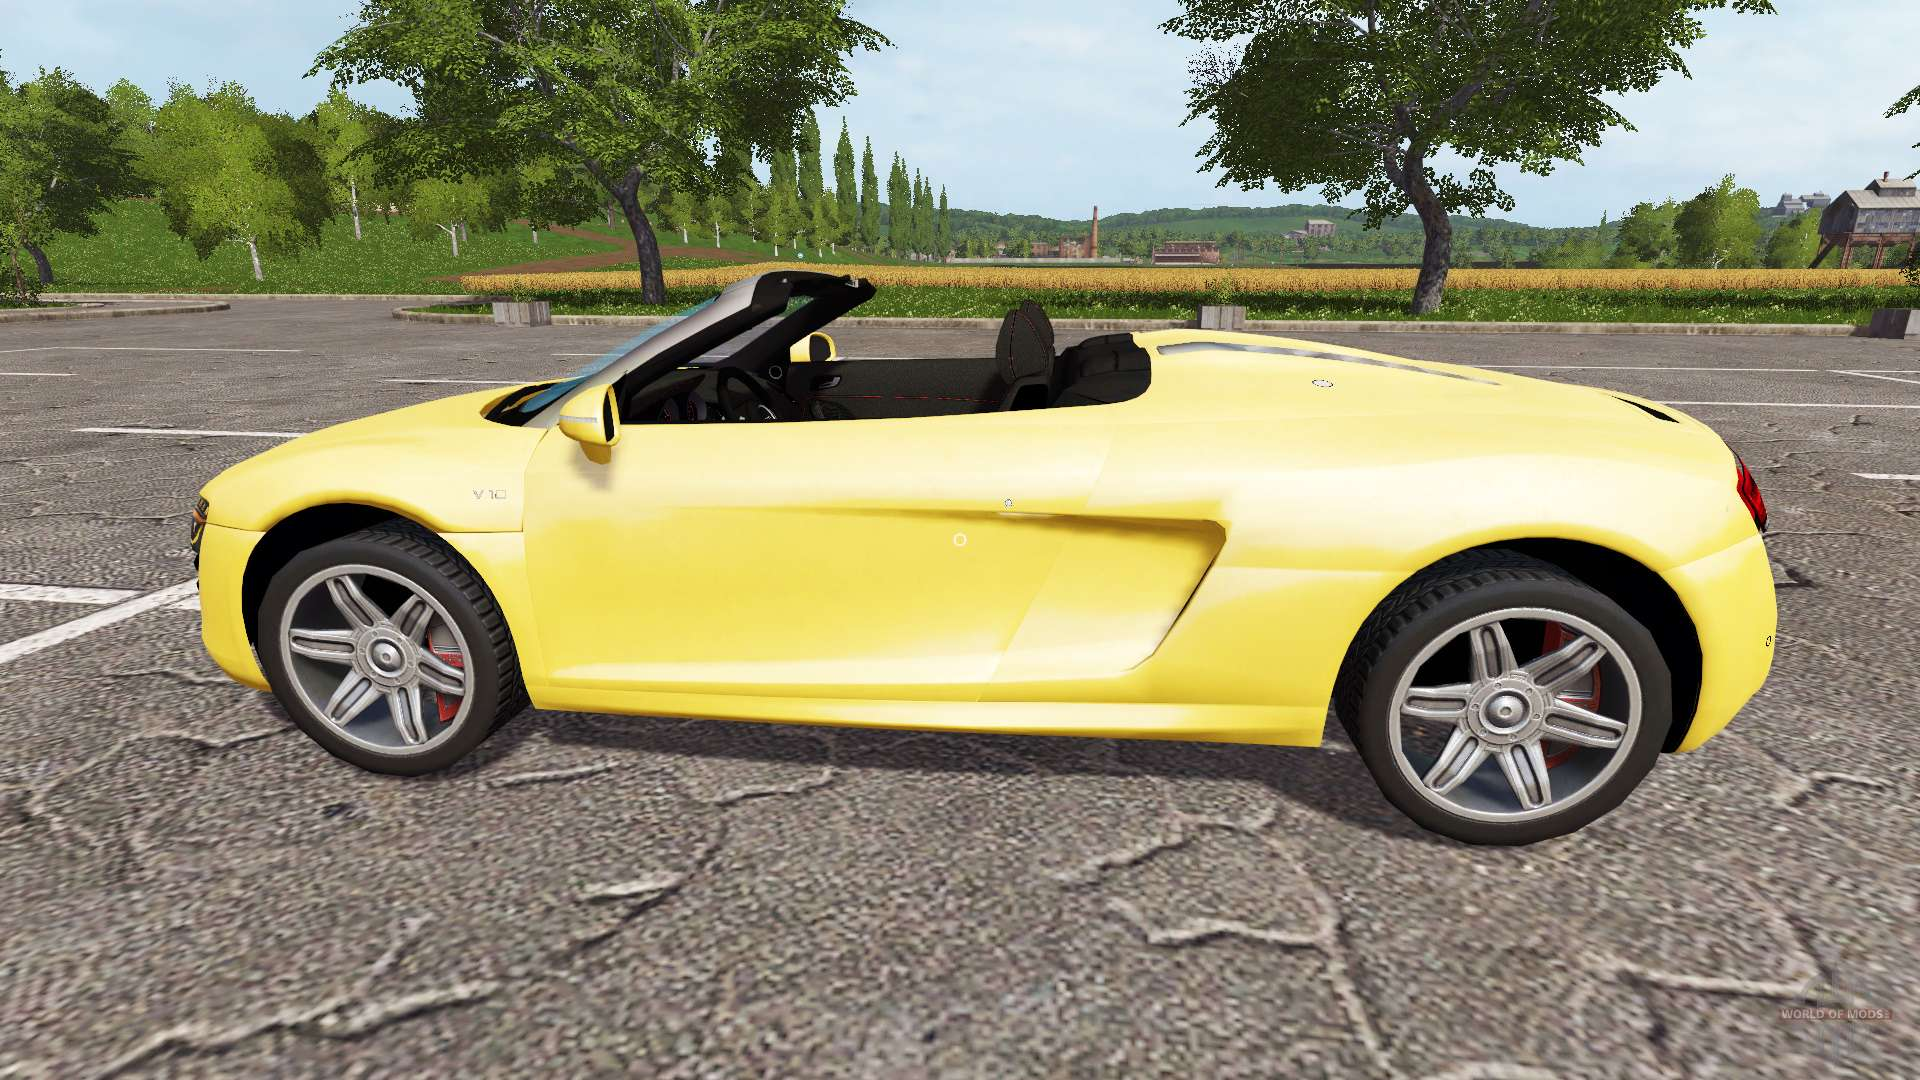 Amazoncom Avigo Audi R8 Spyder 6 Volt Ride On Toys amp Games